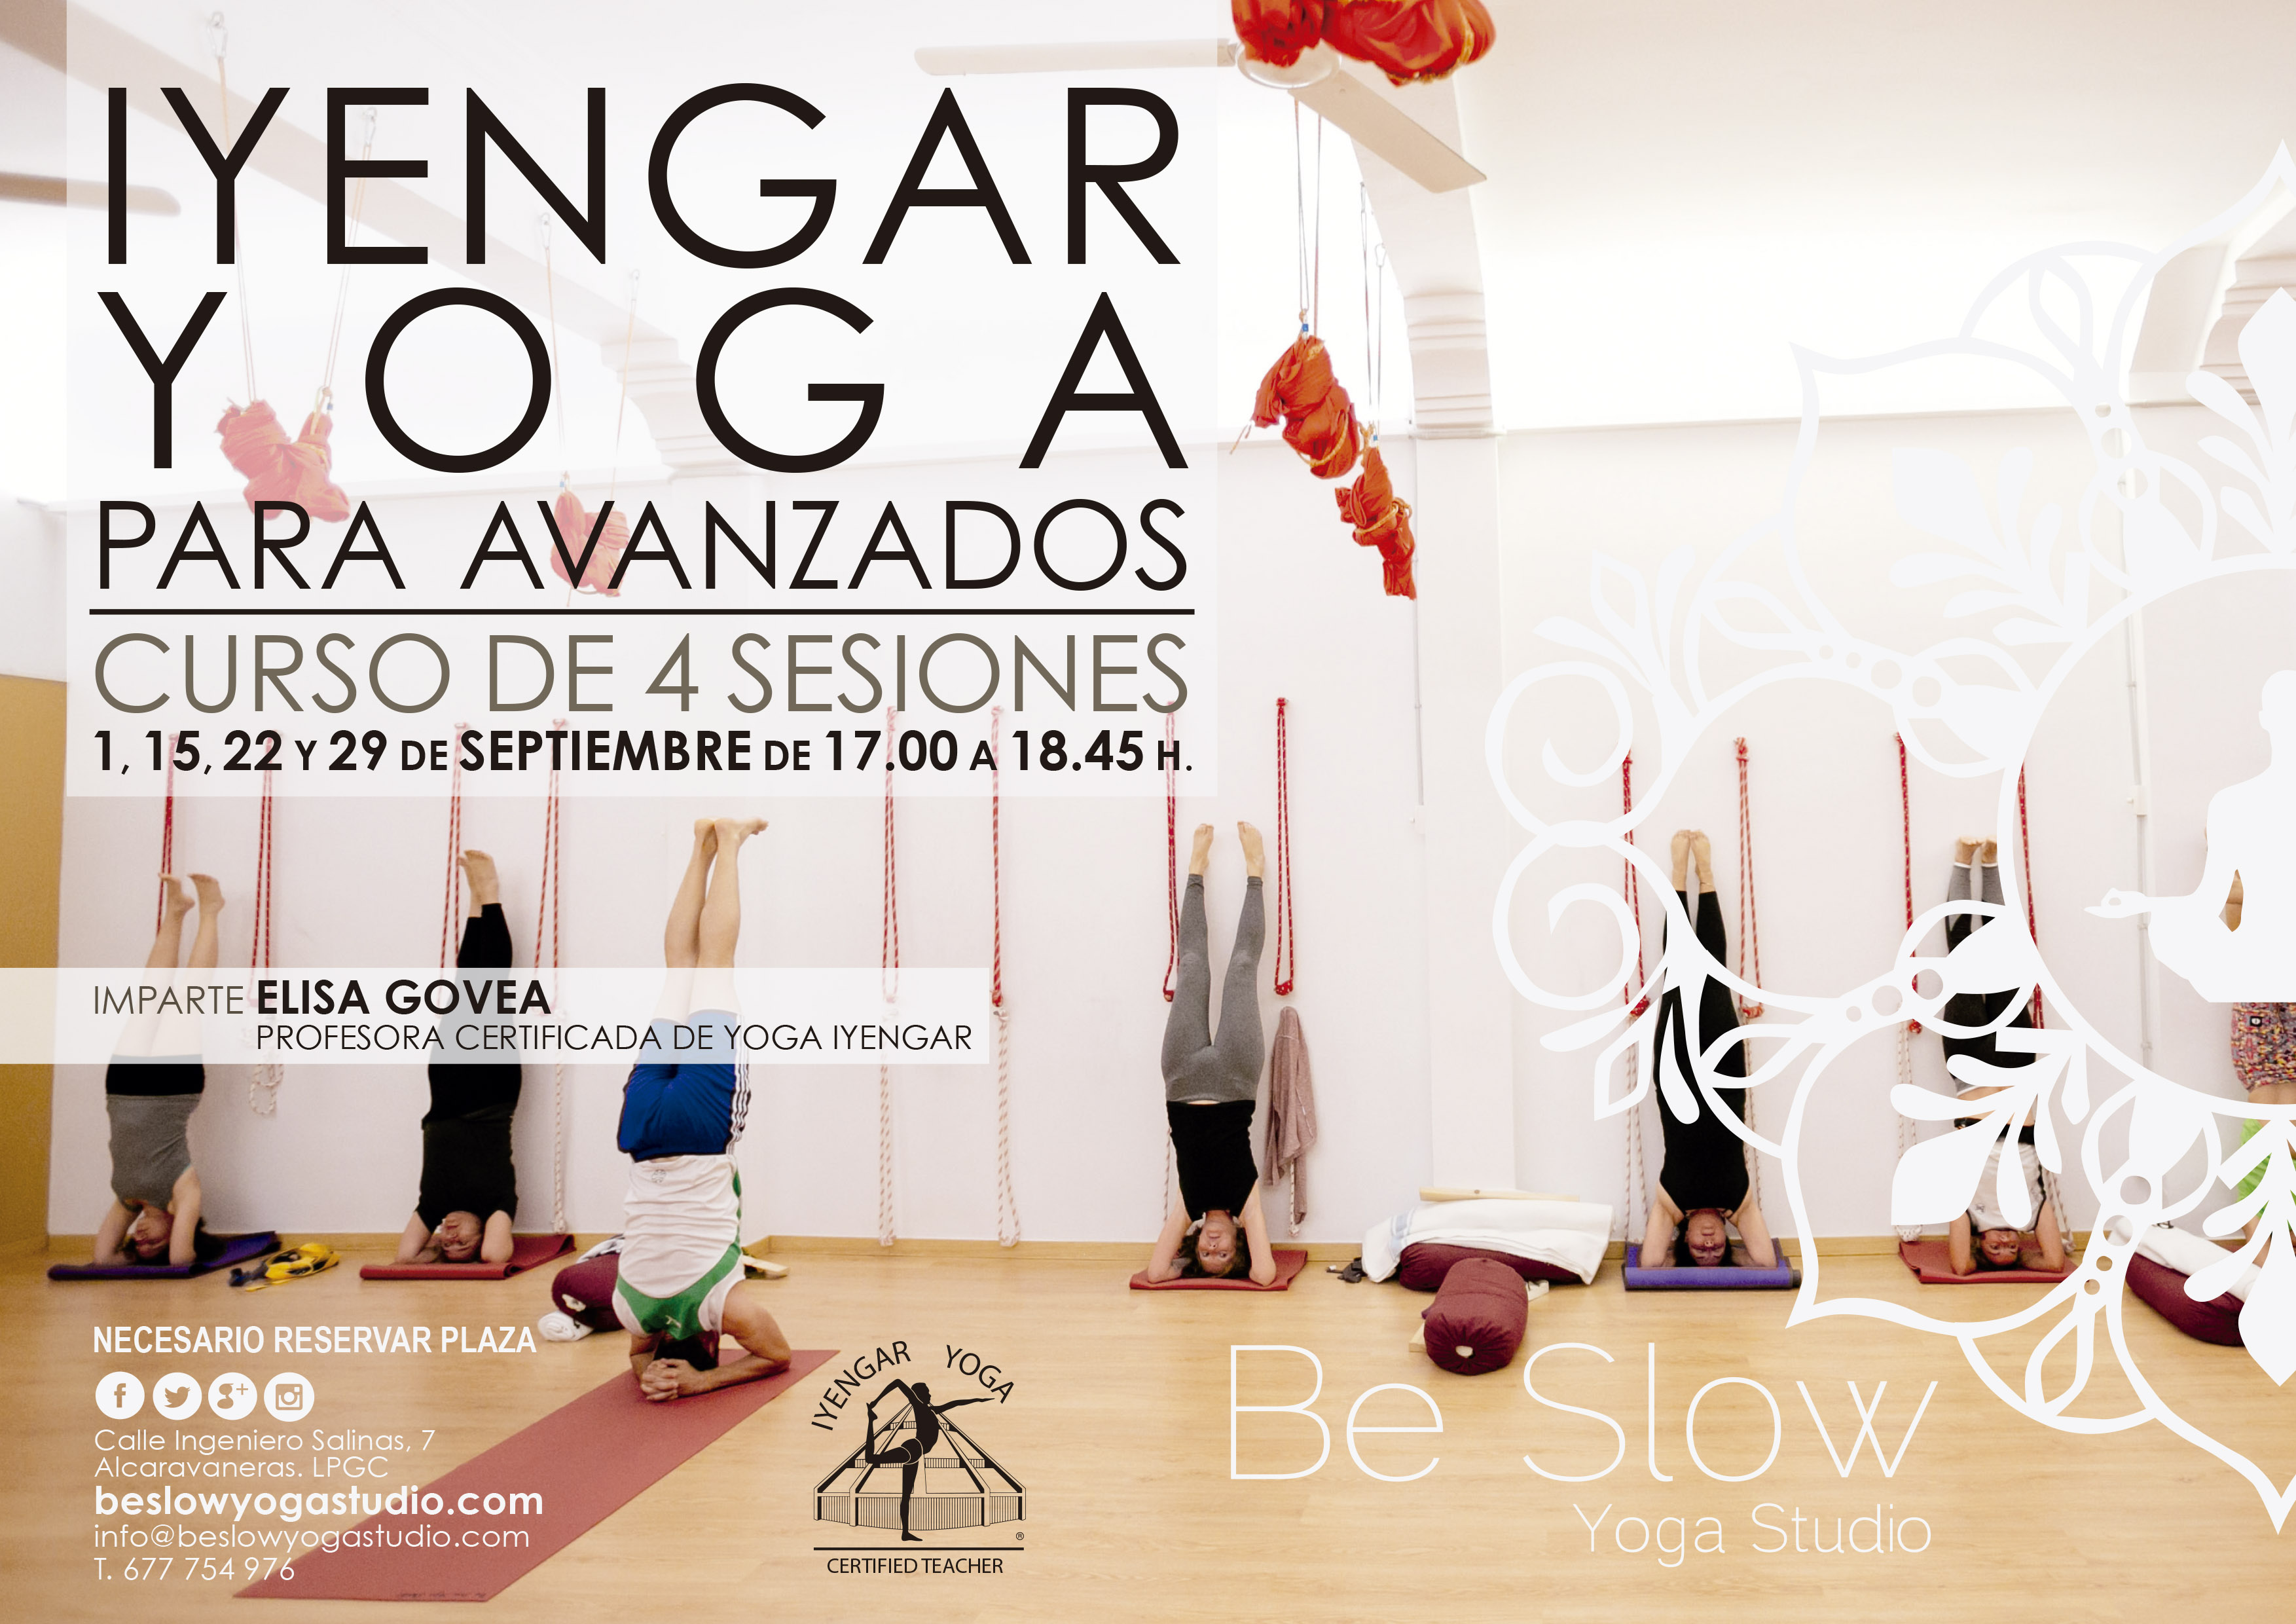 En Septiembre volvemos con un Curso de Iyengar Yoga para Avanzados